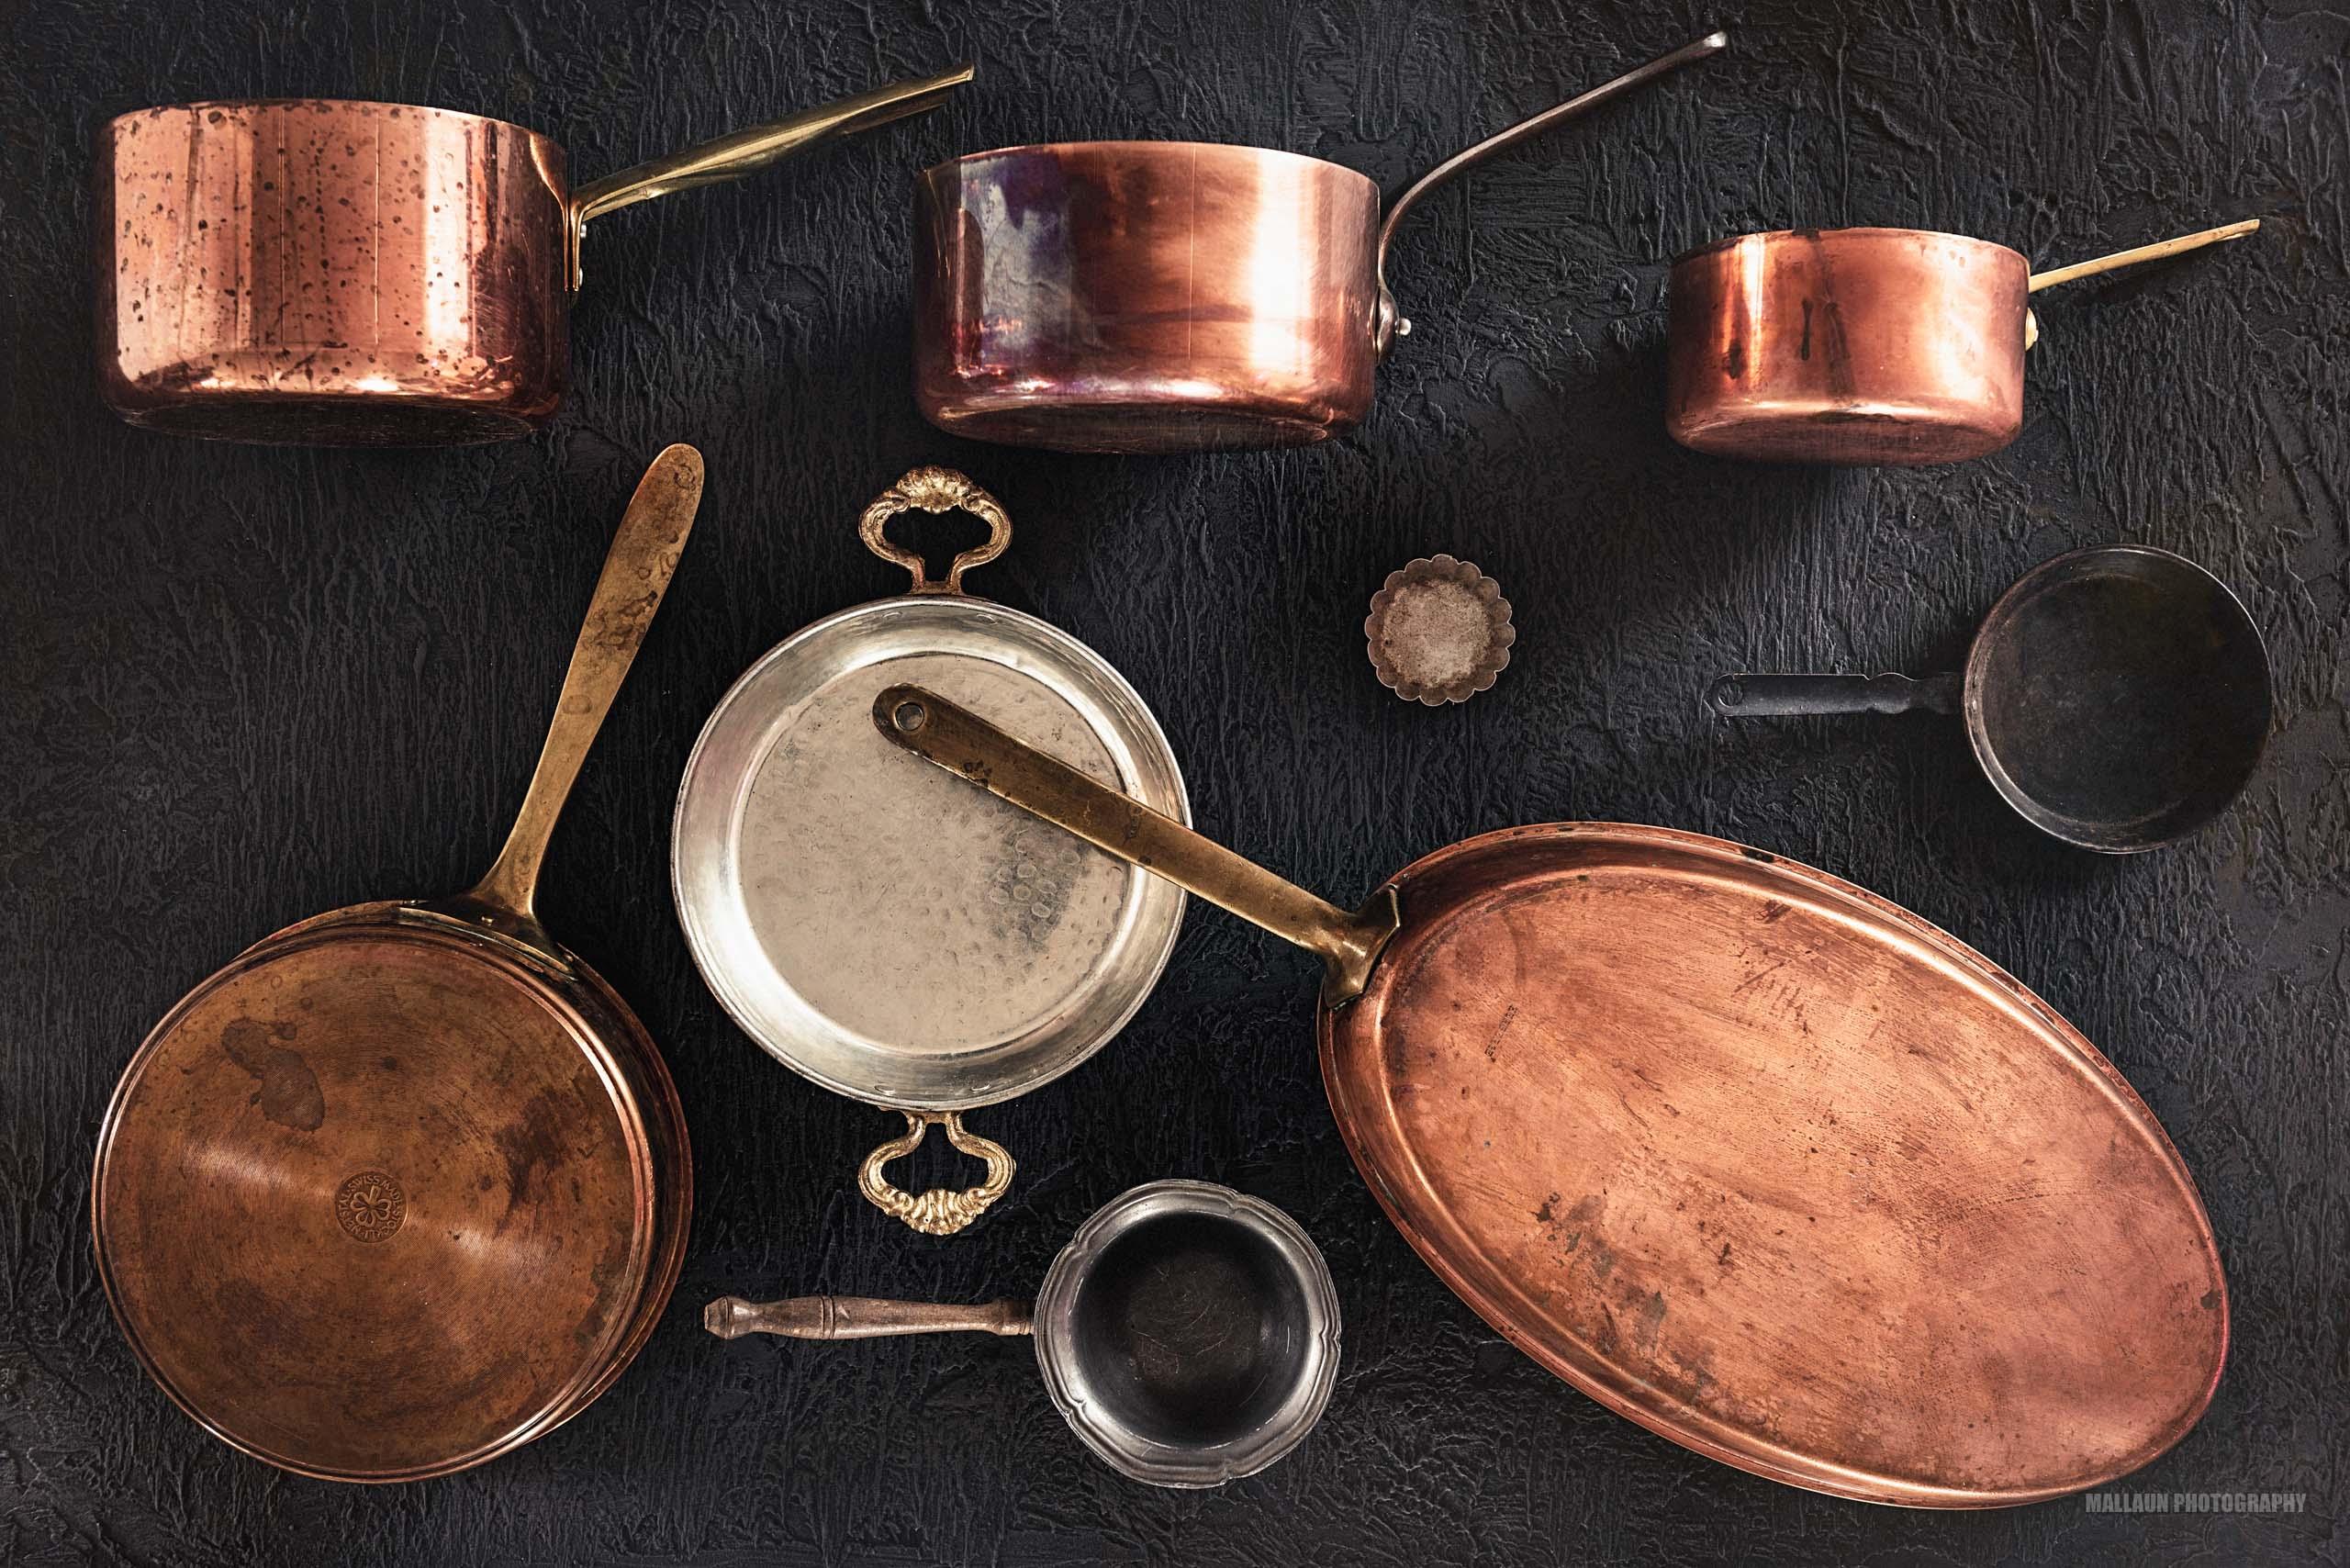 Props & Accessoires (Kupferpfannen) Teller for Food Photography